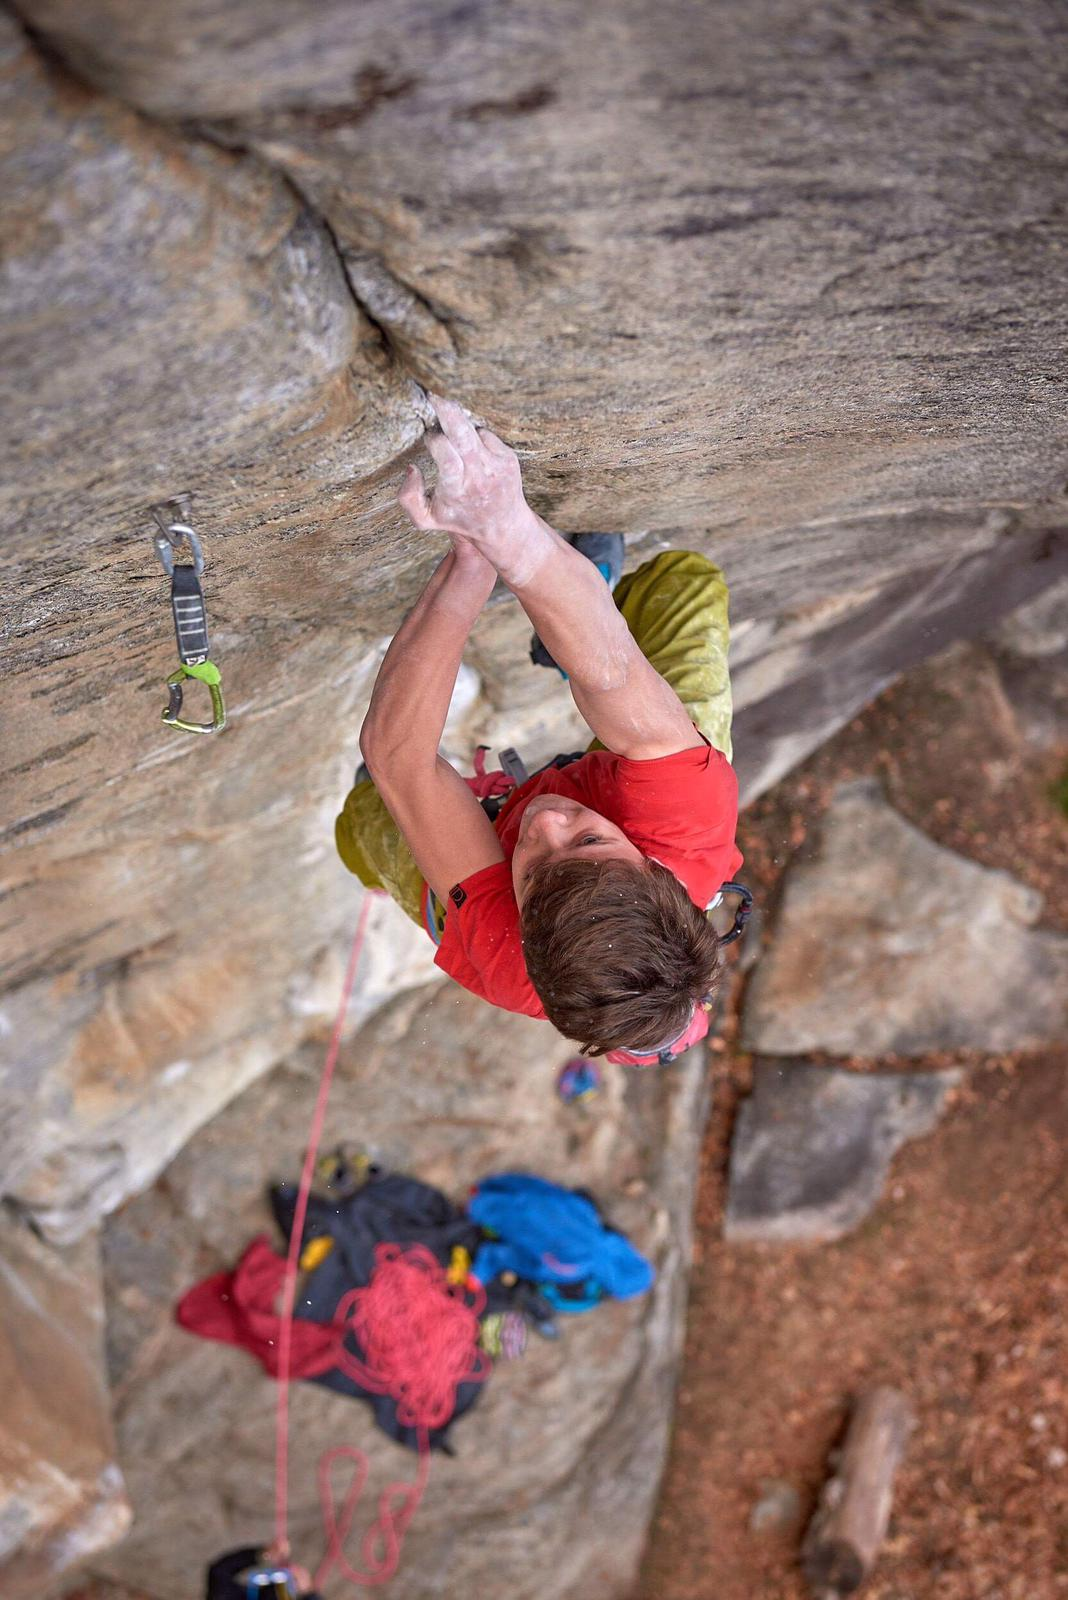 nicolò balducci boulder contest milano climbing expo urban wall competizione arrampicata